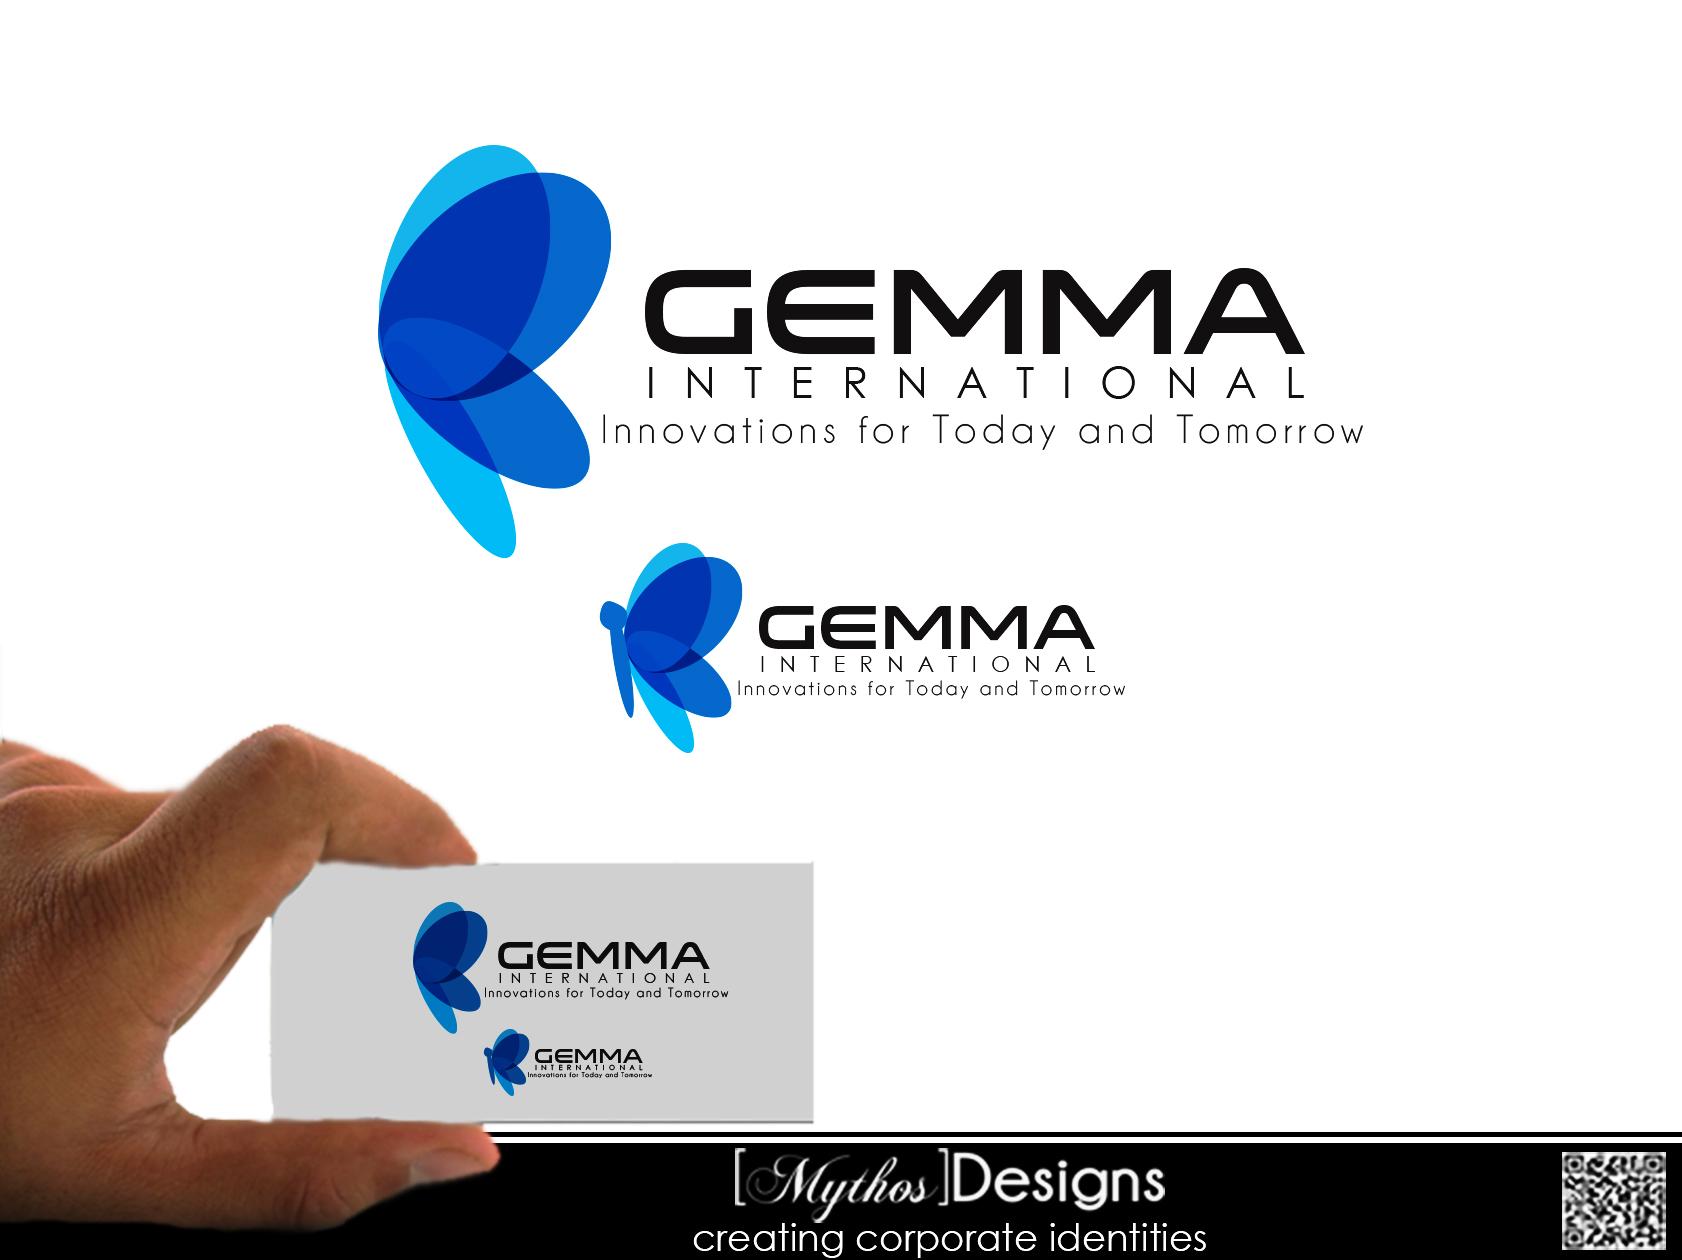 Logo Design by Mythos Designs - Entry No. 50 in the Logo Design Contest Artistic Logo Design for Gemma International.